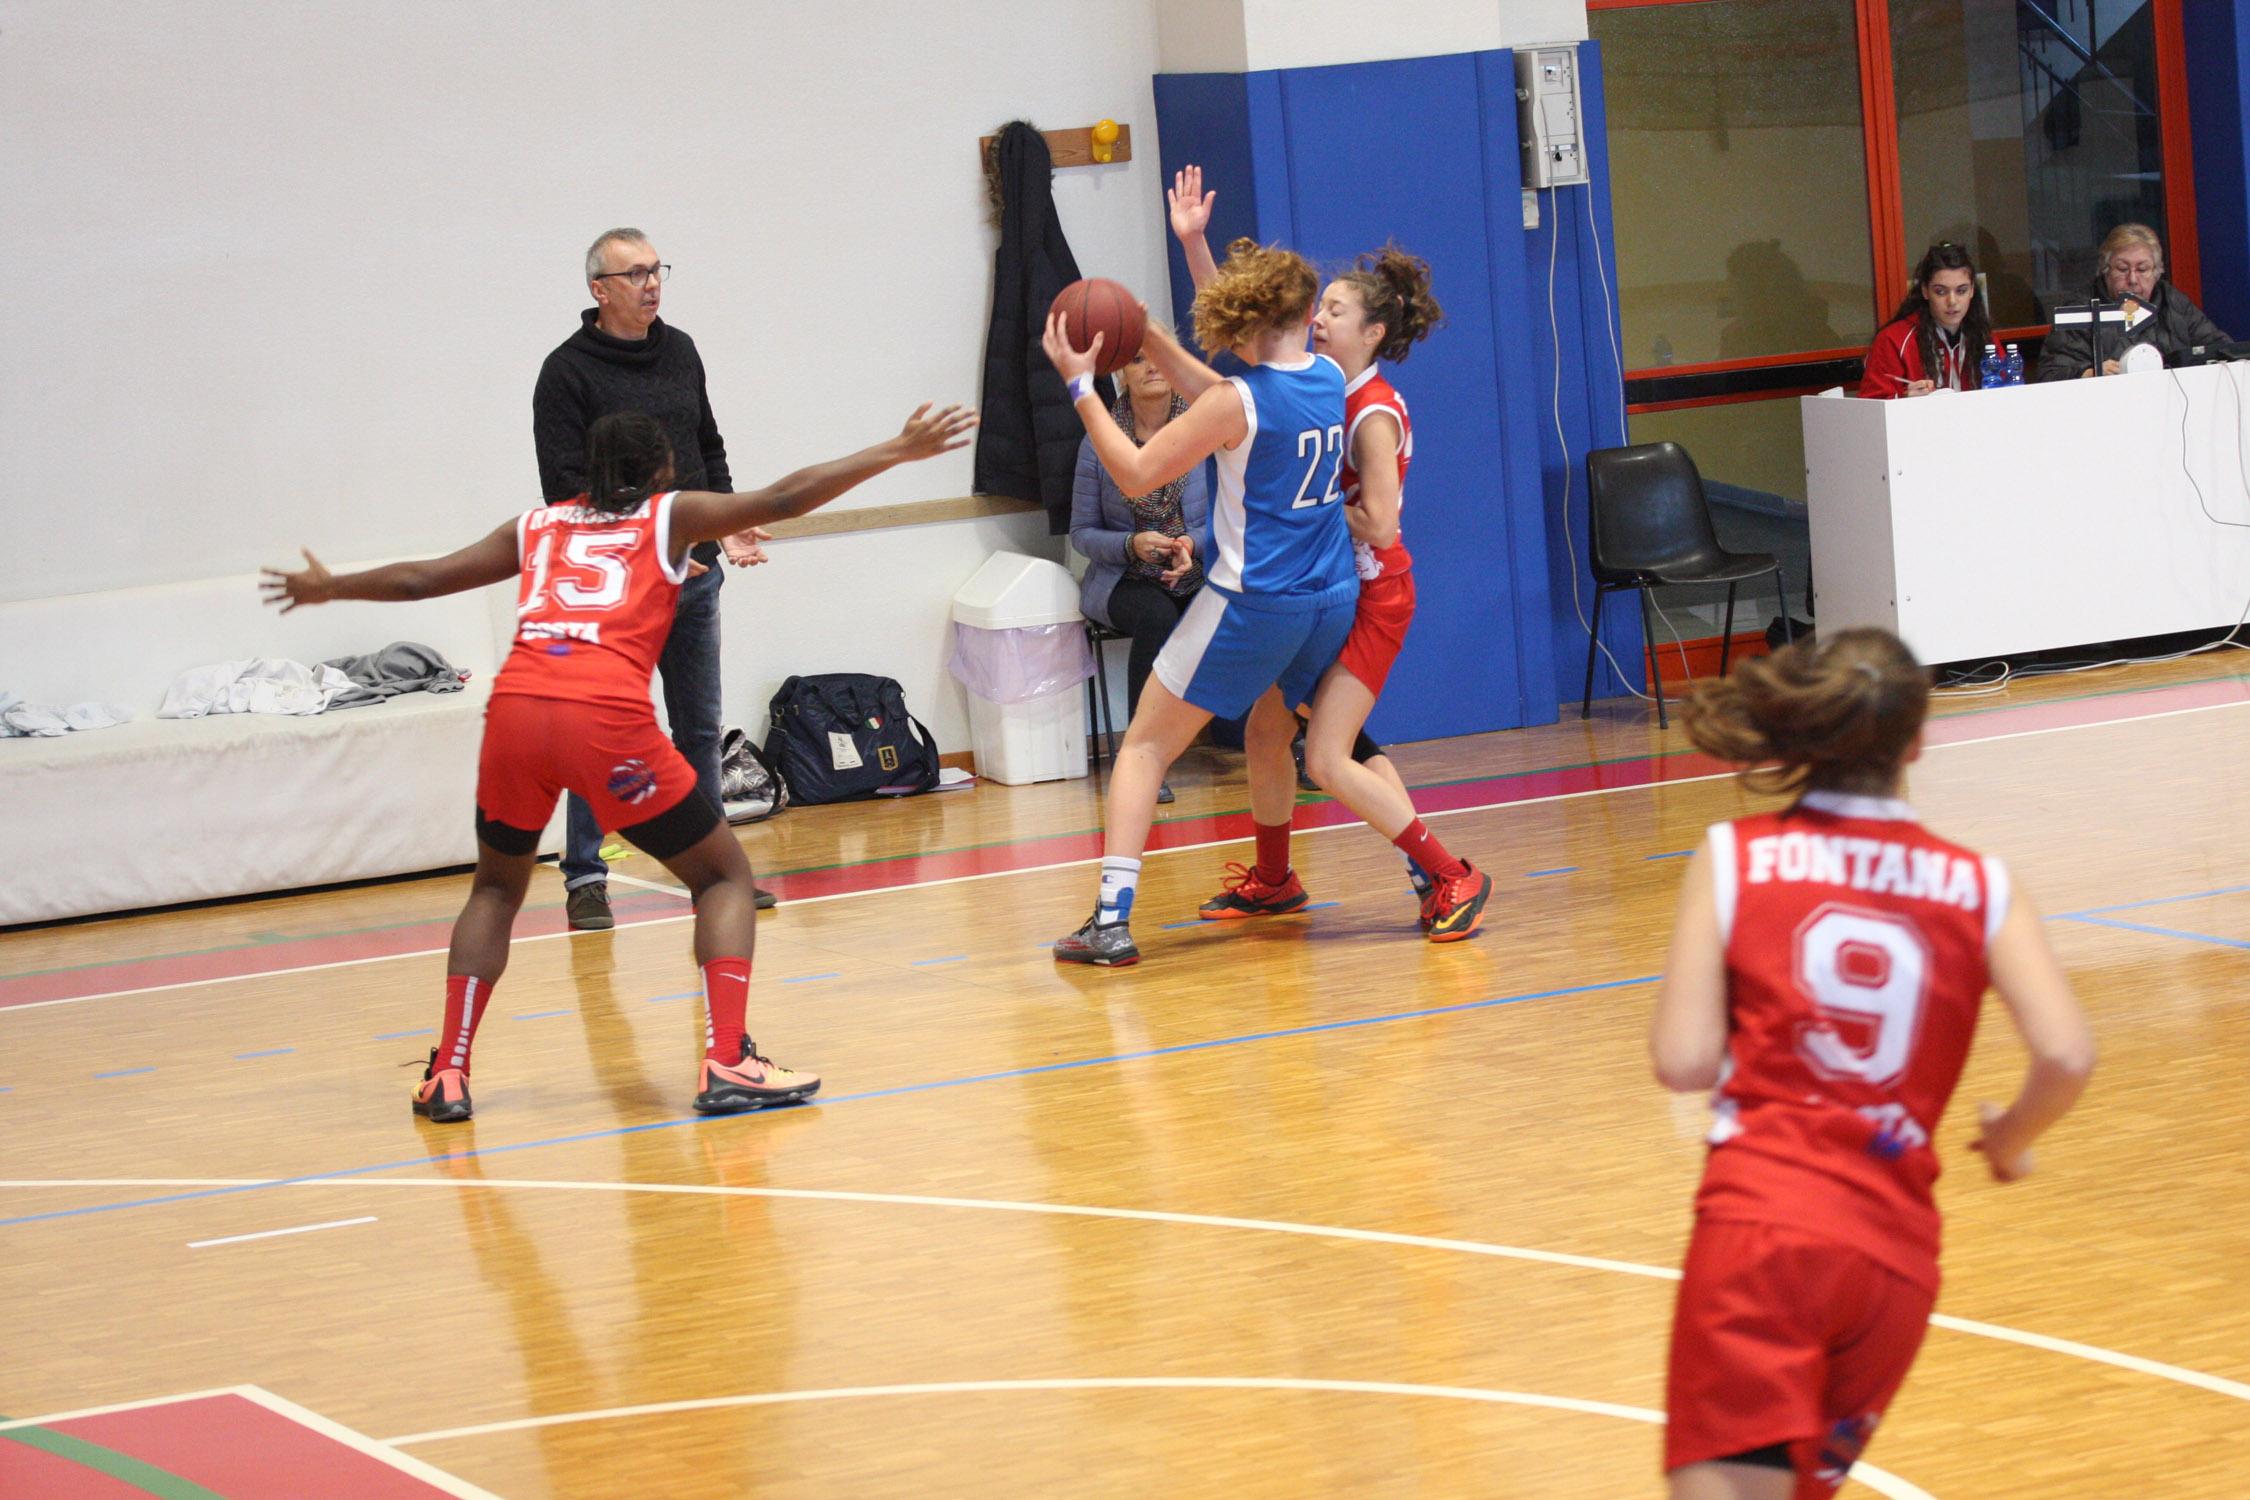 U16E - Costa Masnaga vs Baskettiamo Vittuone 2001 00003.jpg